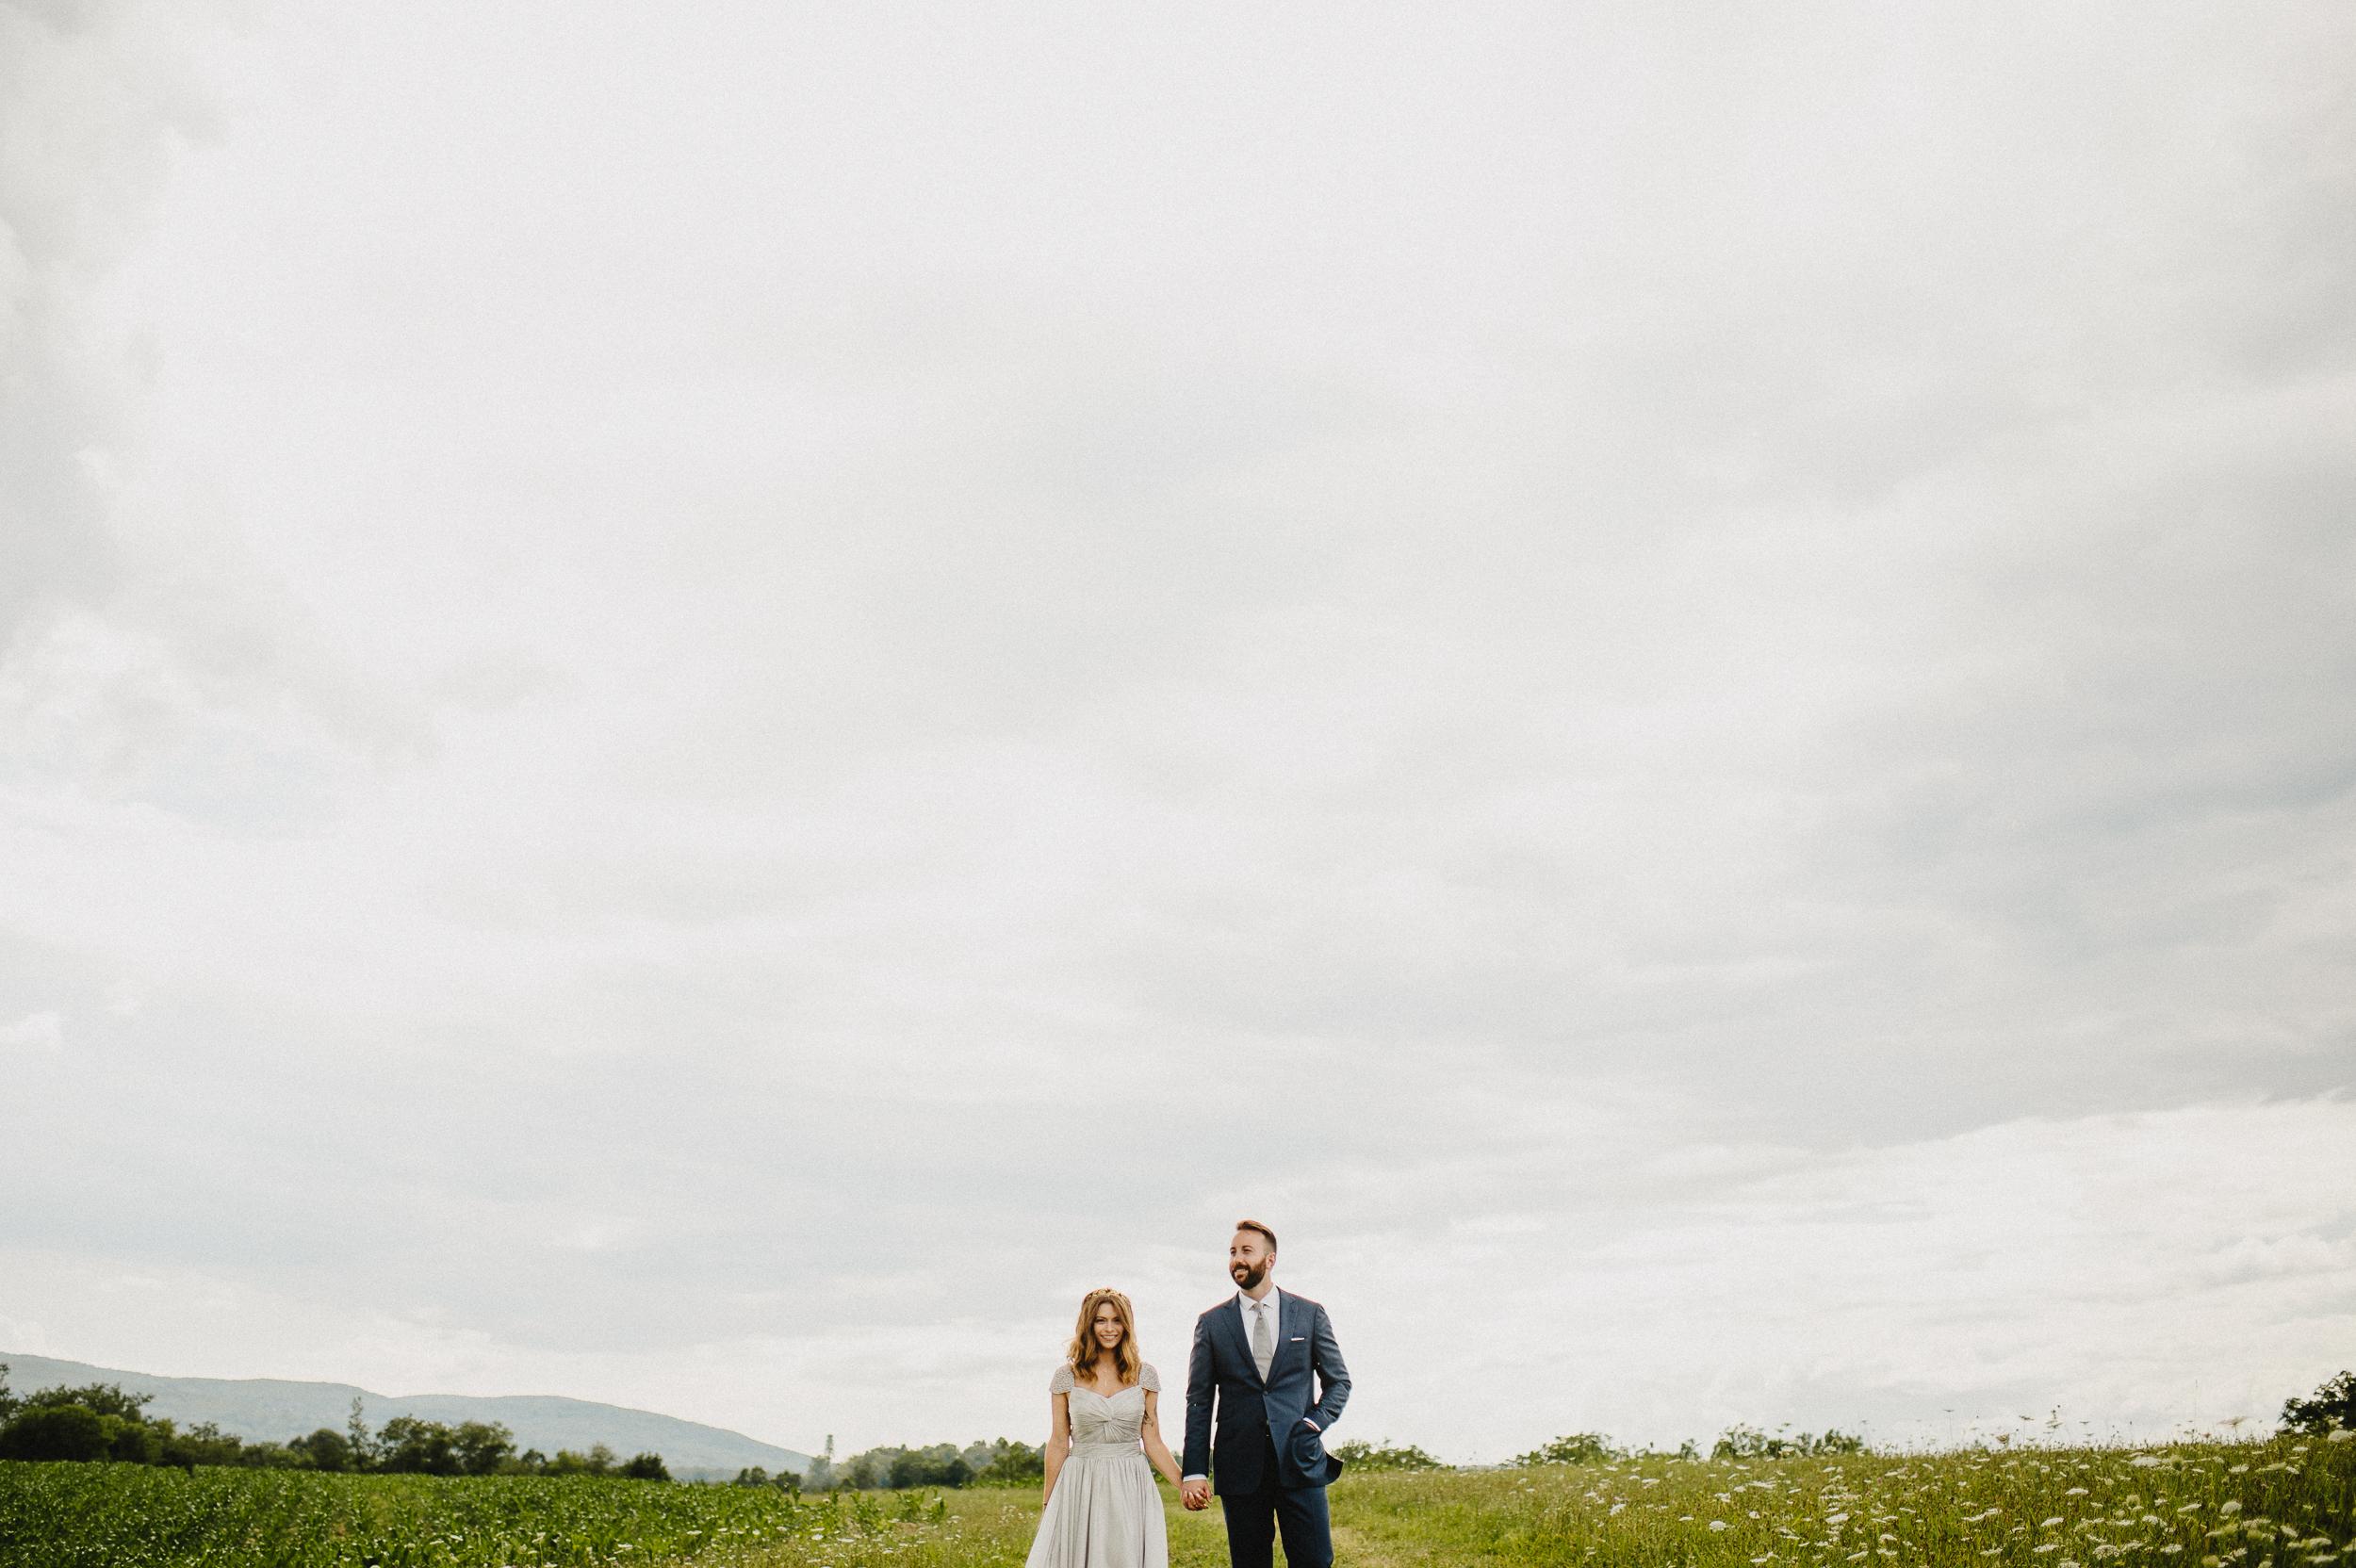 Pioneer-farms-warwick-new-york-wedding-photographer026.jpg